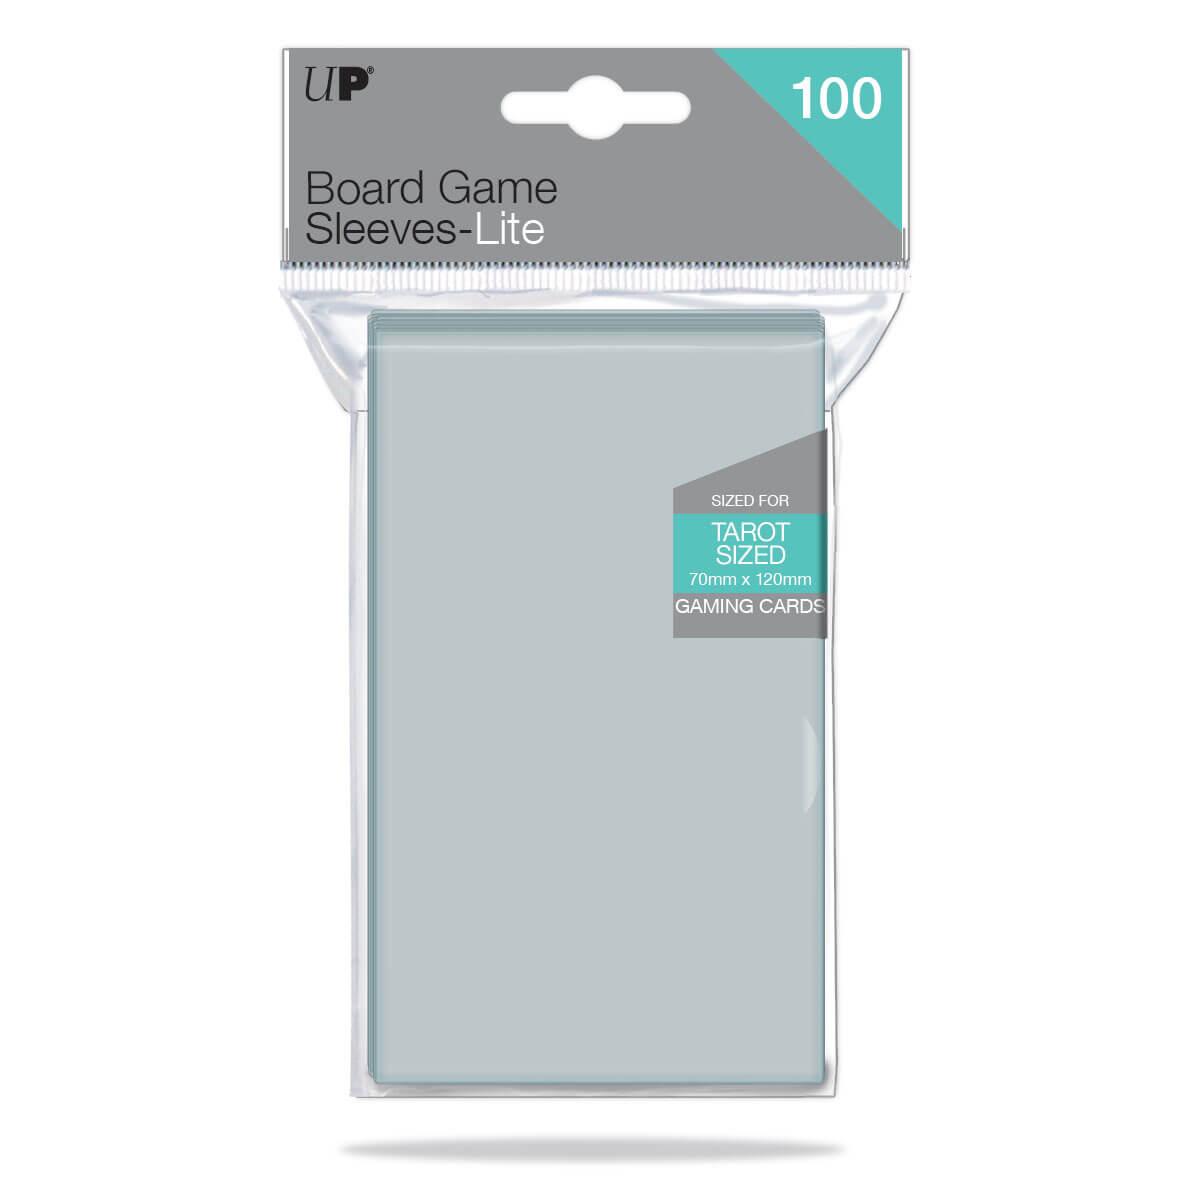 Lite Board Game Tarot Sleeves 70mm x 120mm 100ct